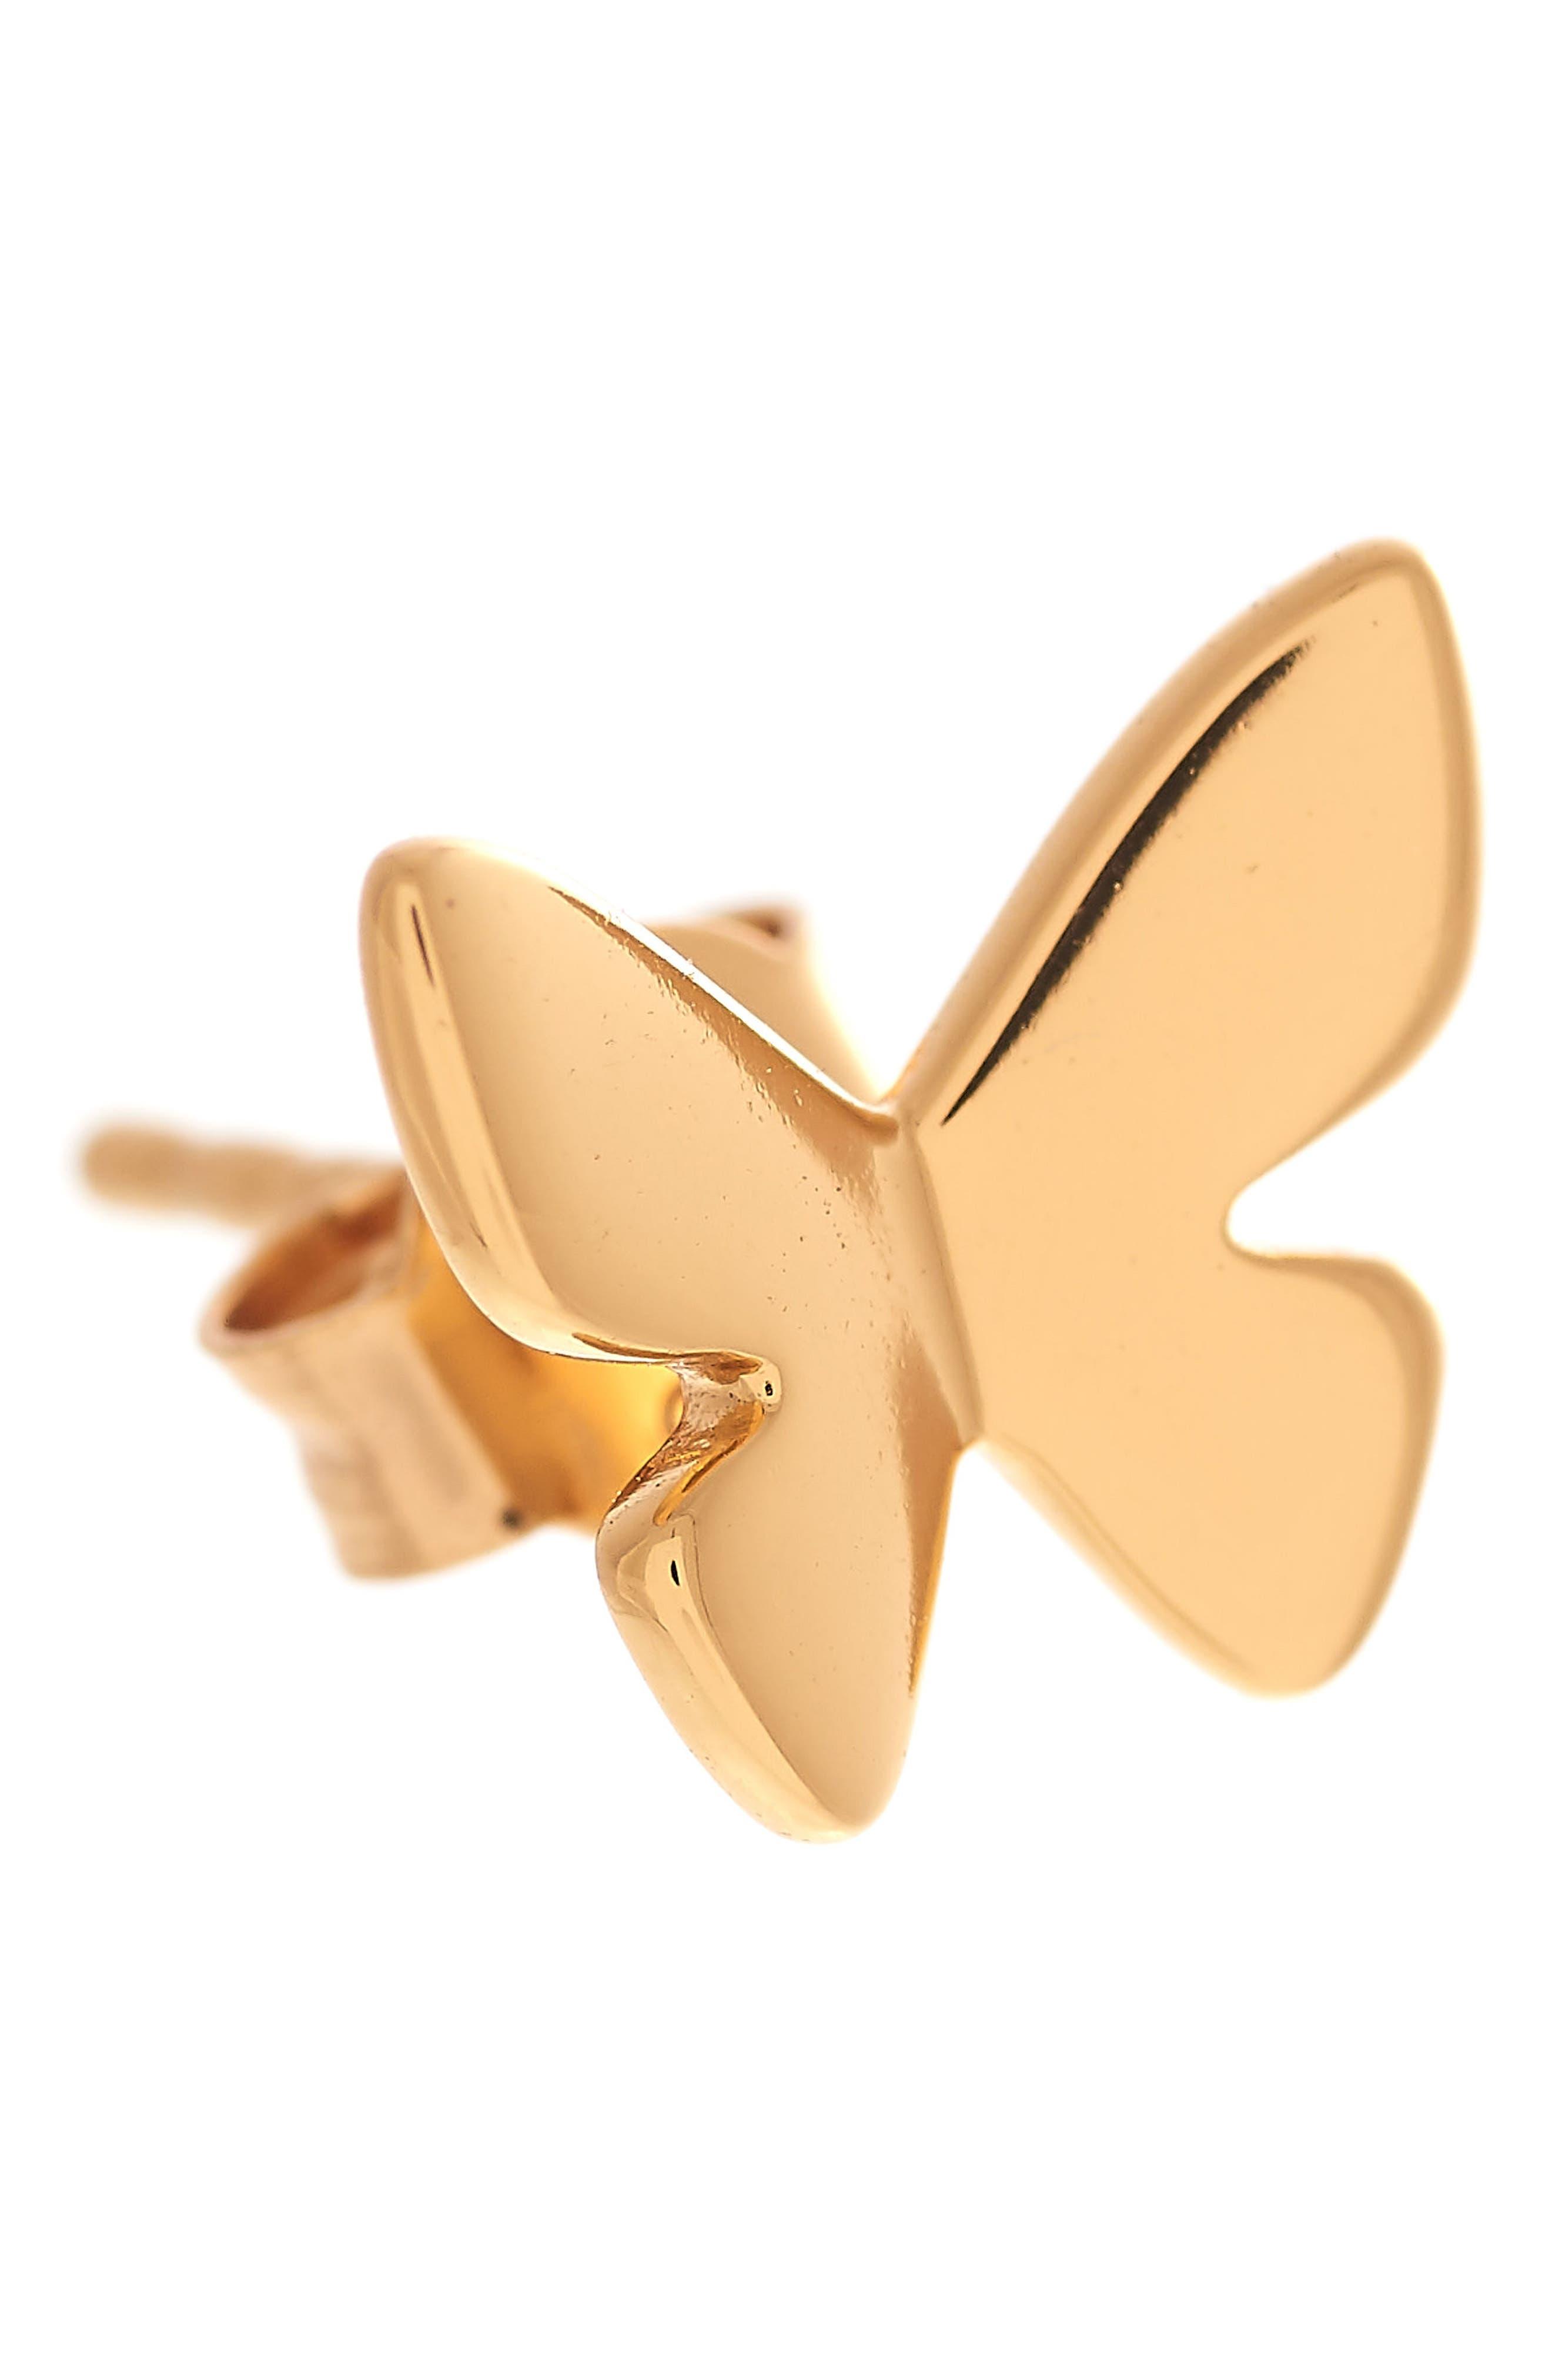 Social Butterfly Stud Earrings,                             Alternate thumbnail 2, color,                             Gold